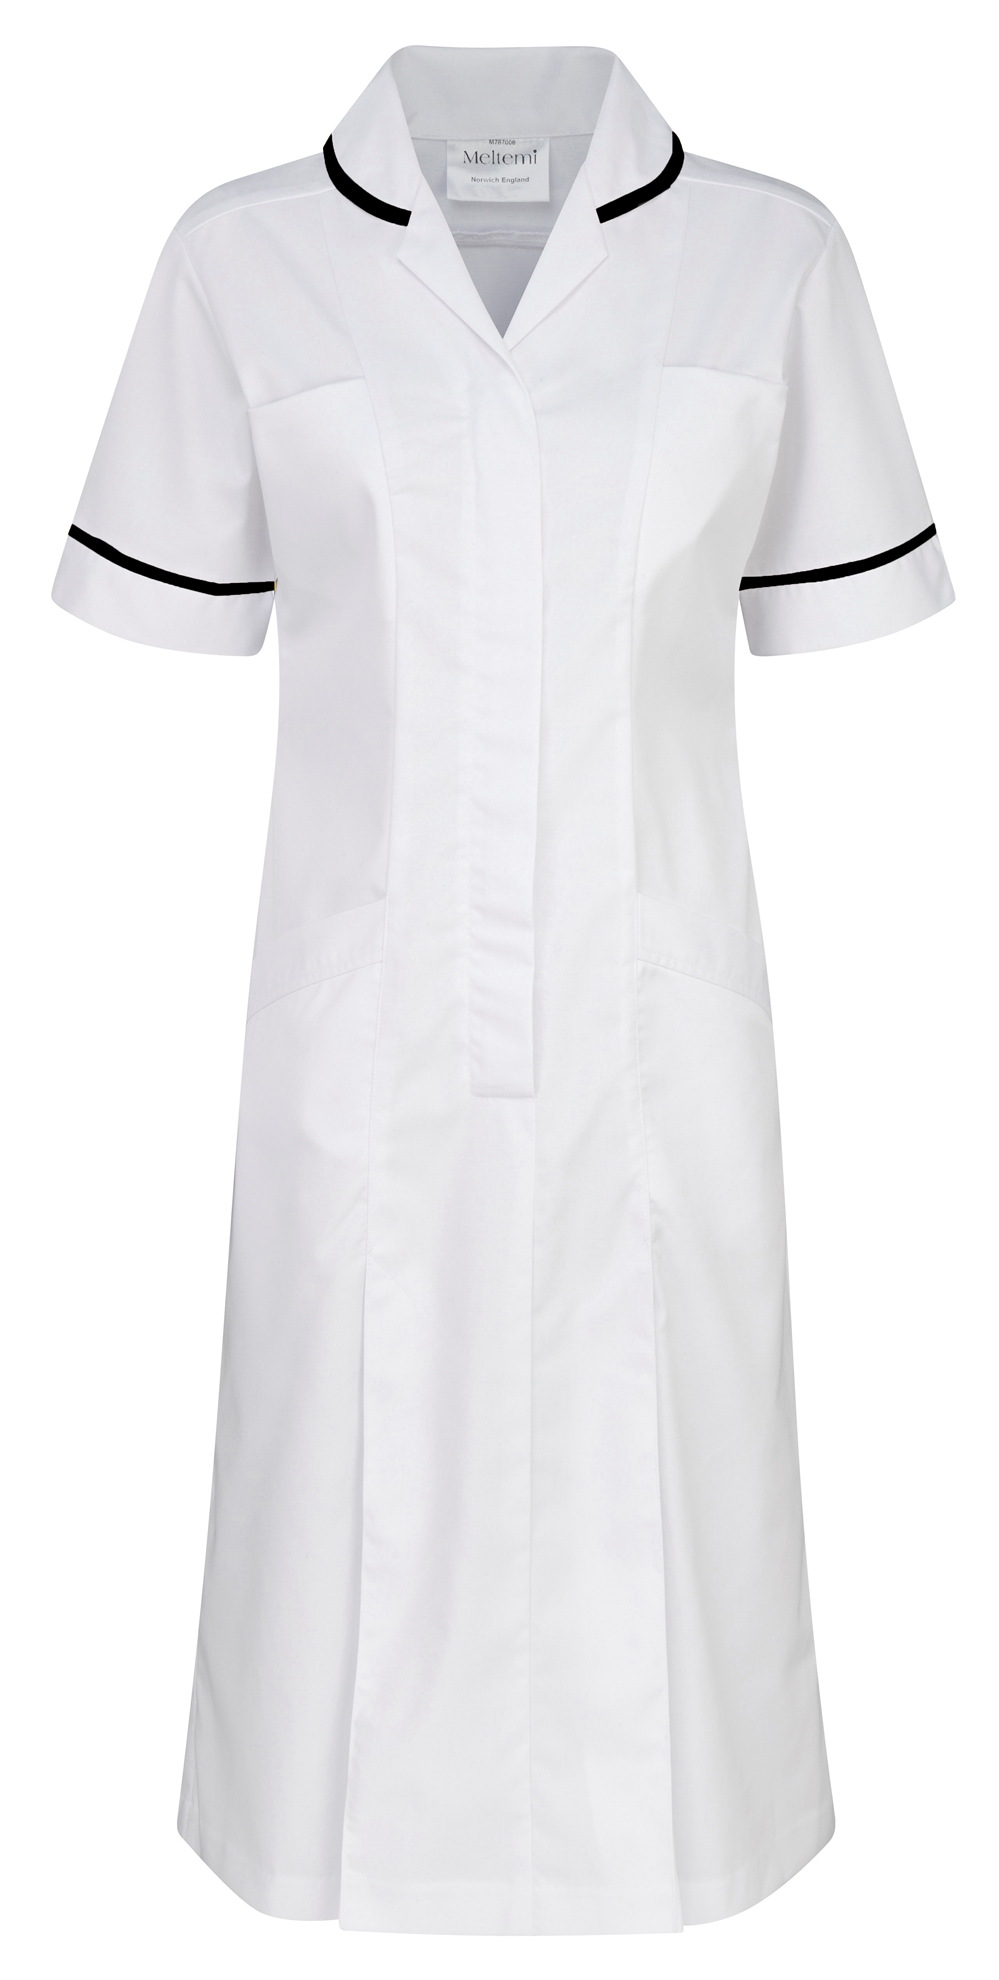 Picture of Plain Colour Dress - White/Black